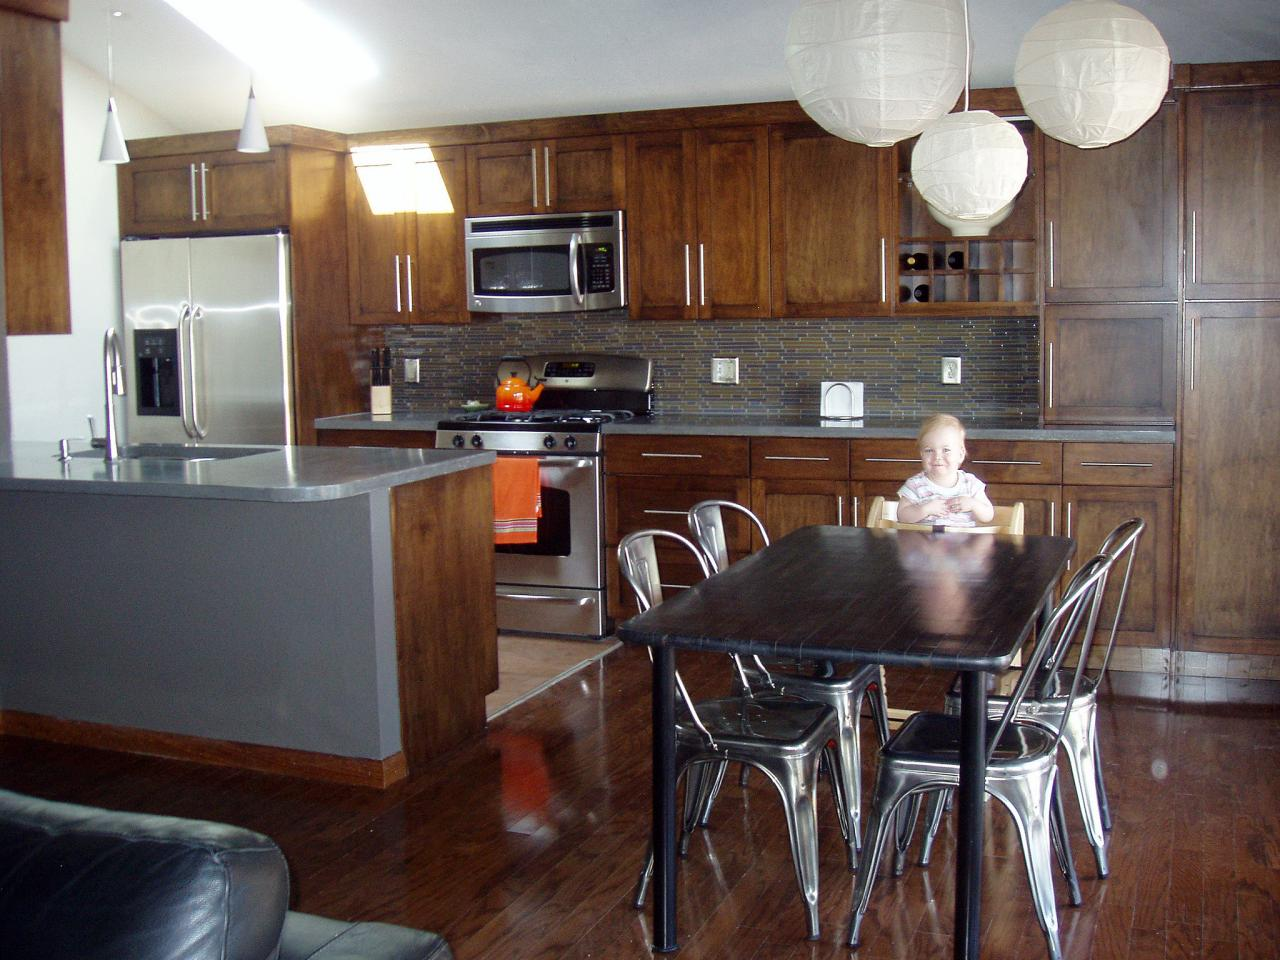 Uncategorized Kitchen Concrete Countertops concrete kitchen countertops pictures ideas from hgtv dave stimmel